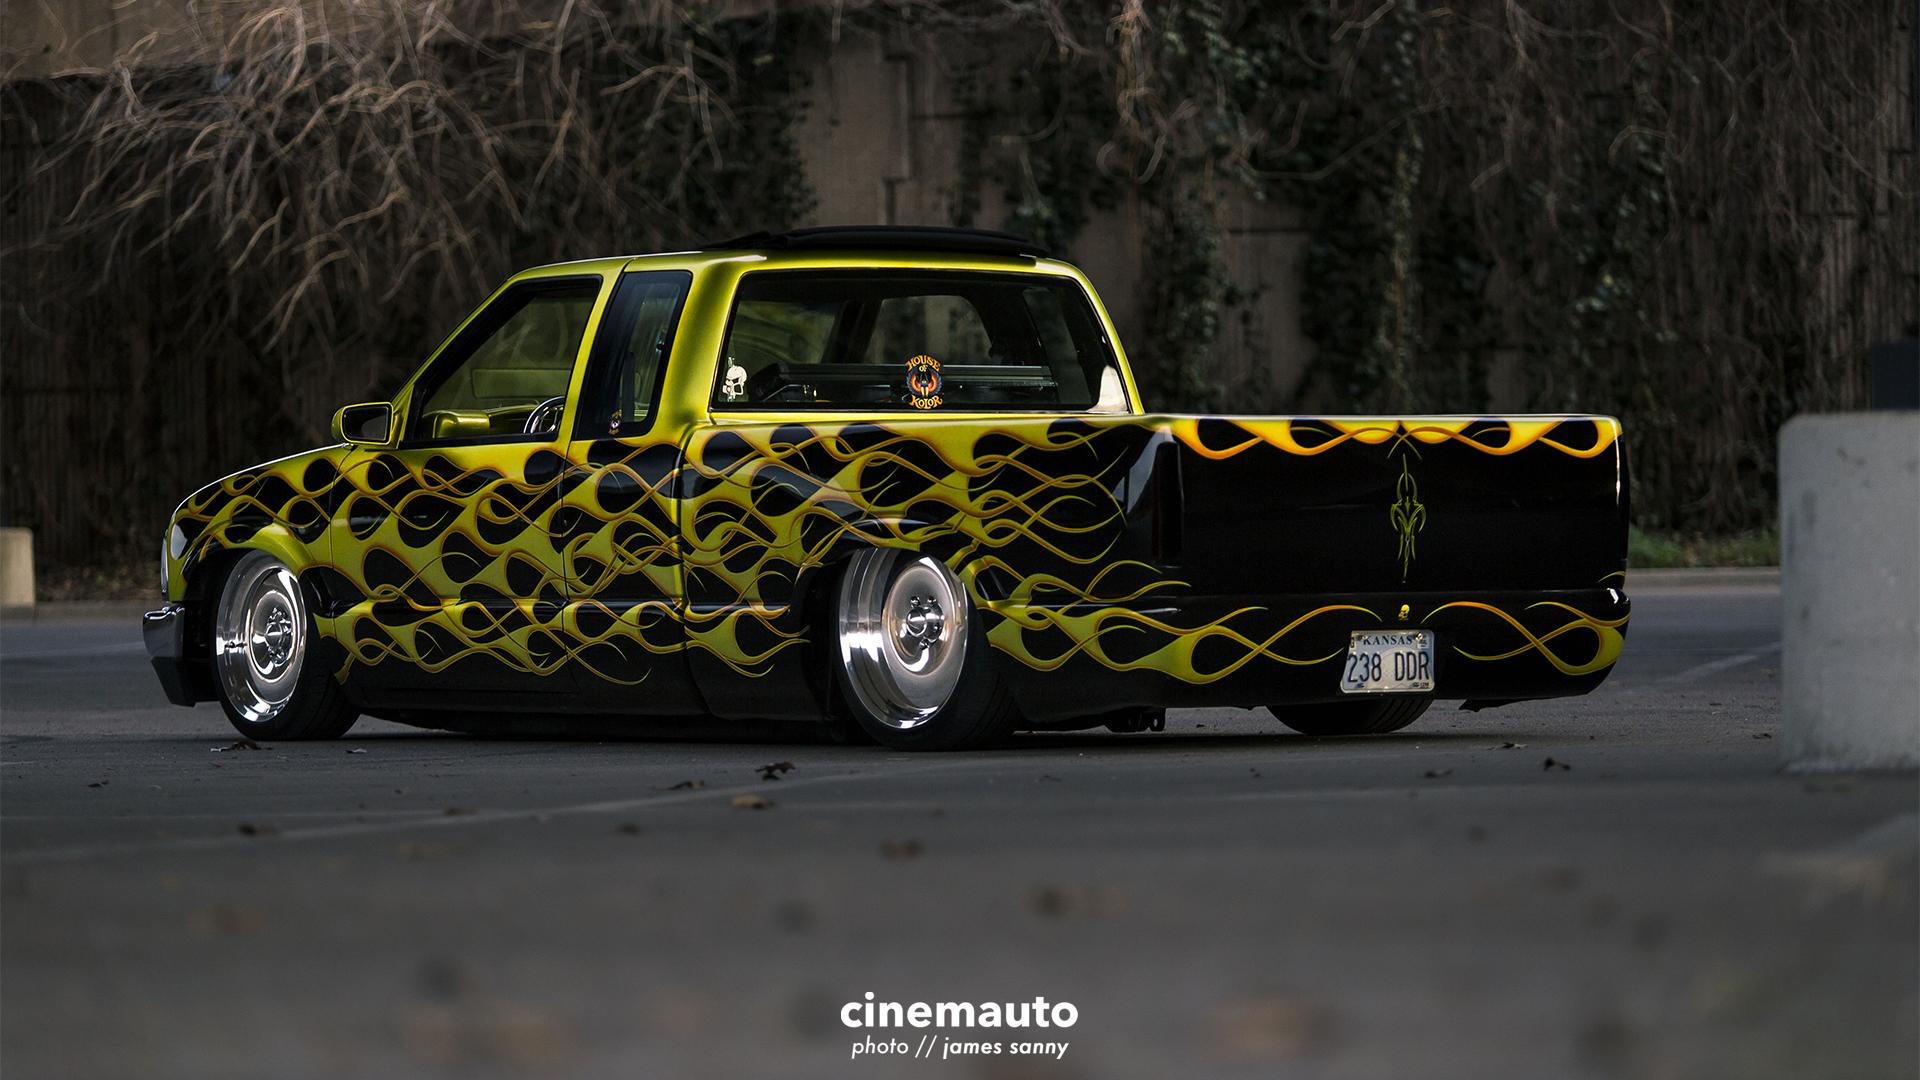 cinemauto-wichita-automotive-photographer-james-sanny-Jsm.jpg